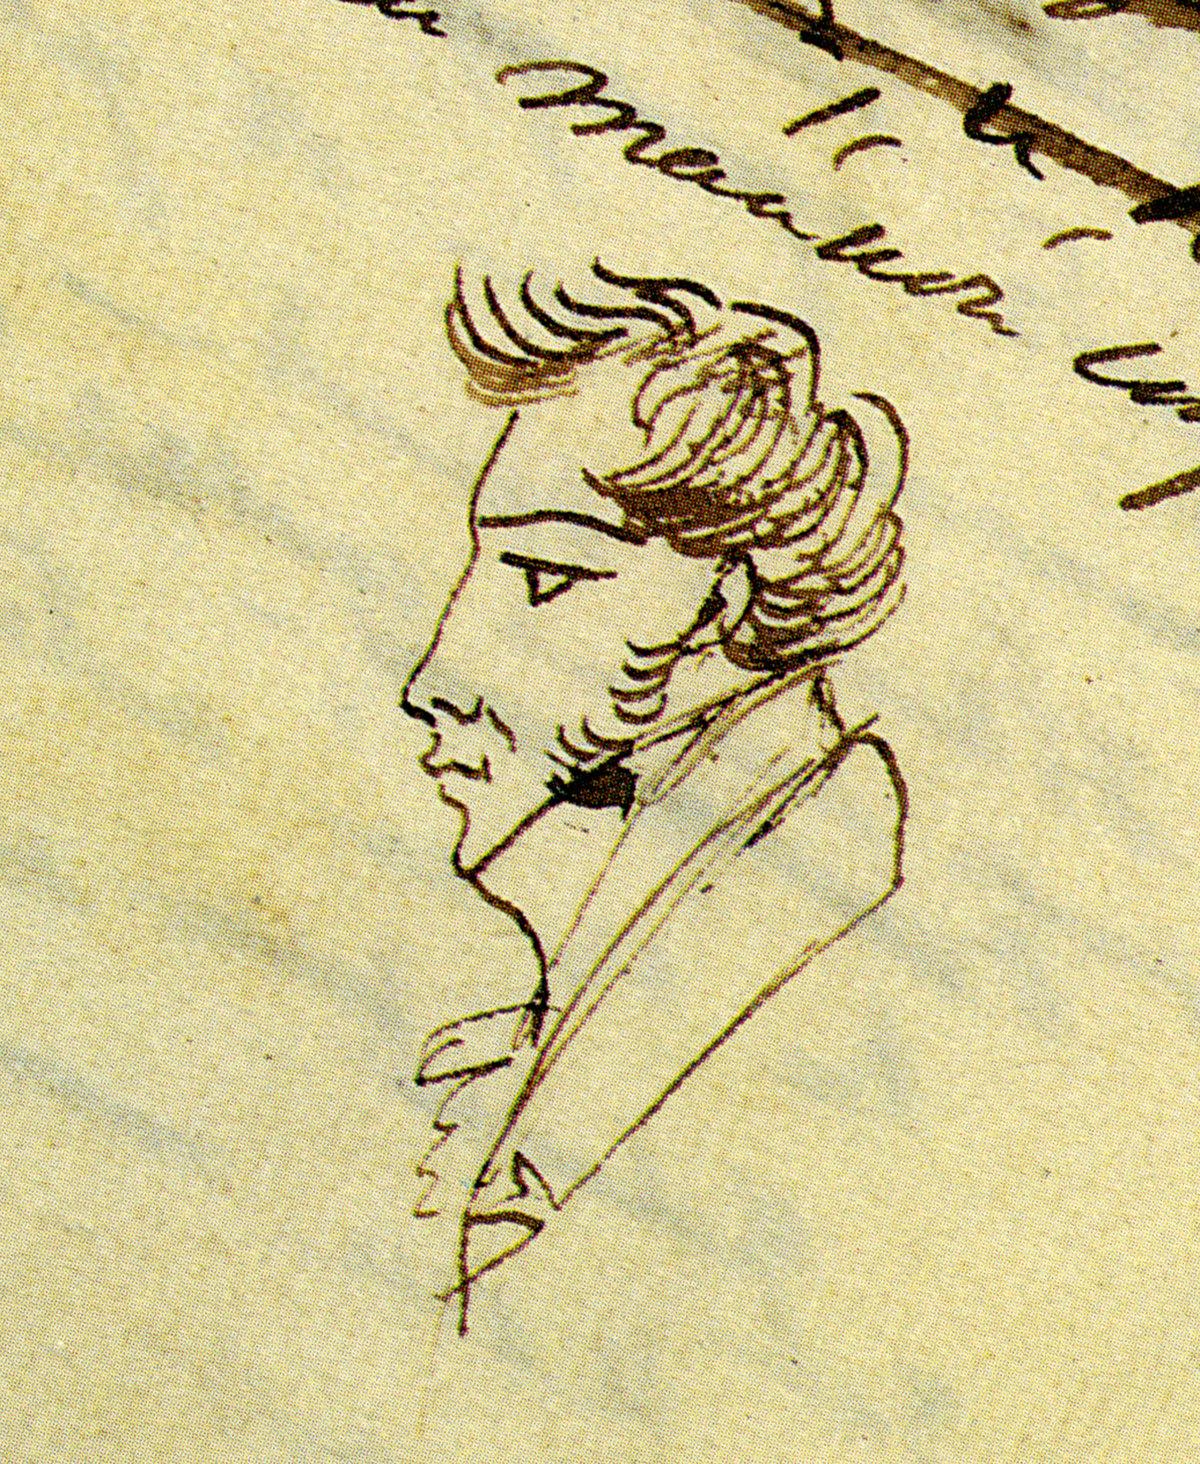 астрономы полякова татьяна лицейский пушкин картинки фото